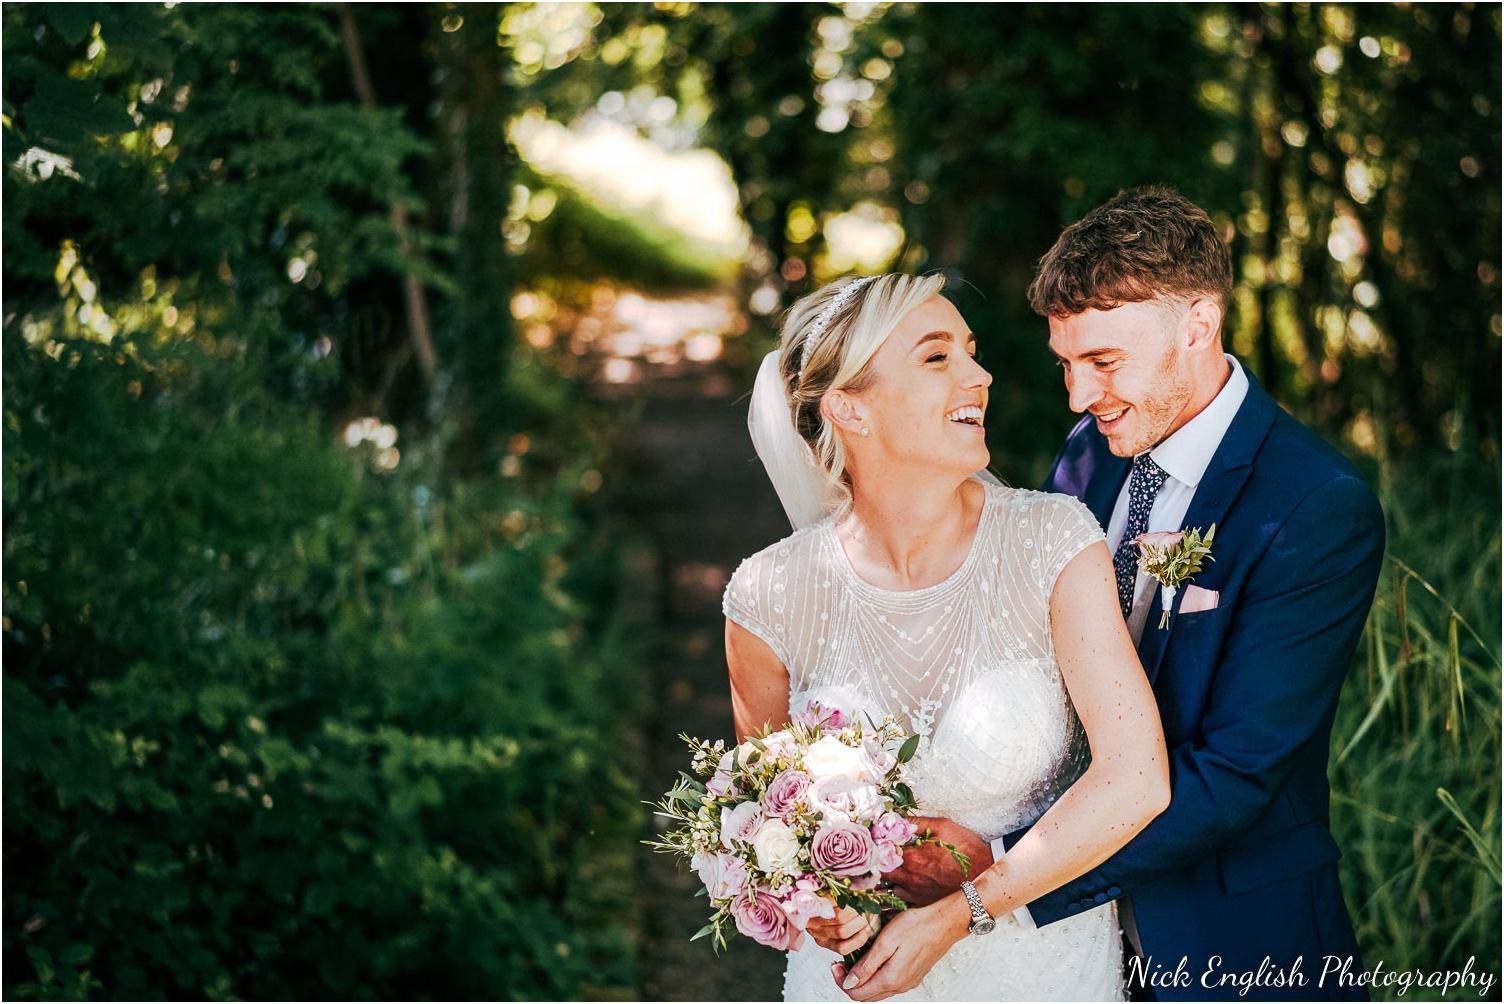 Mitton_Hall_Wedding_Photograph-99.jpg